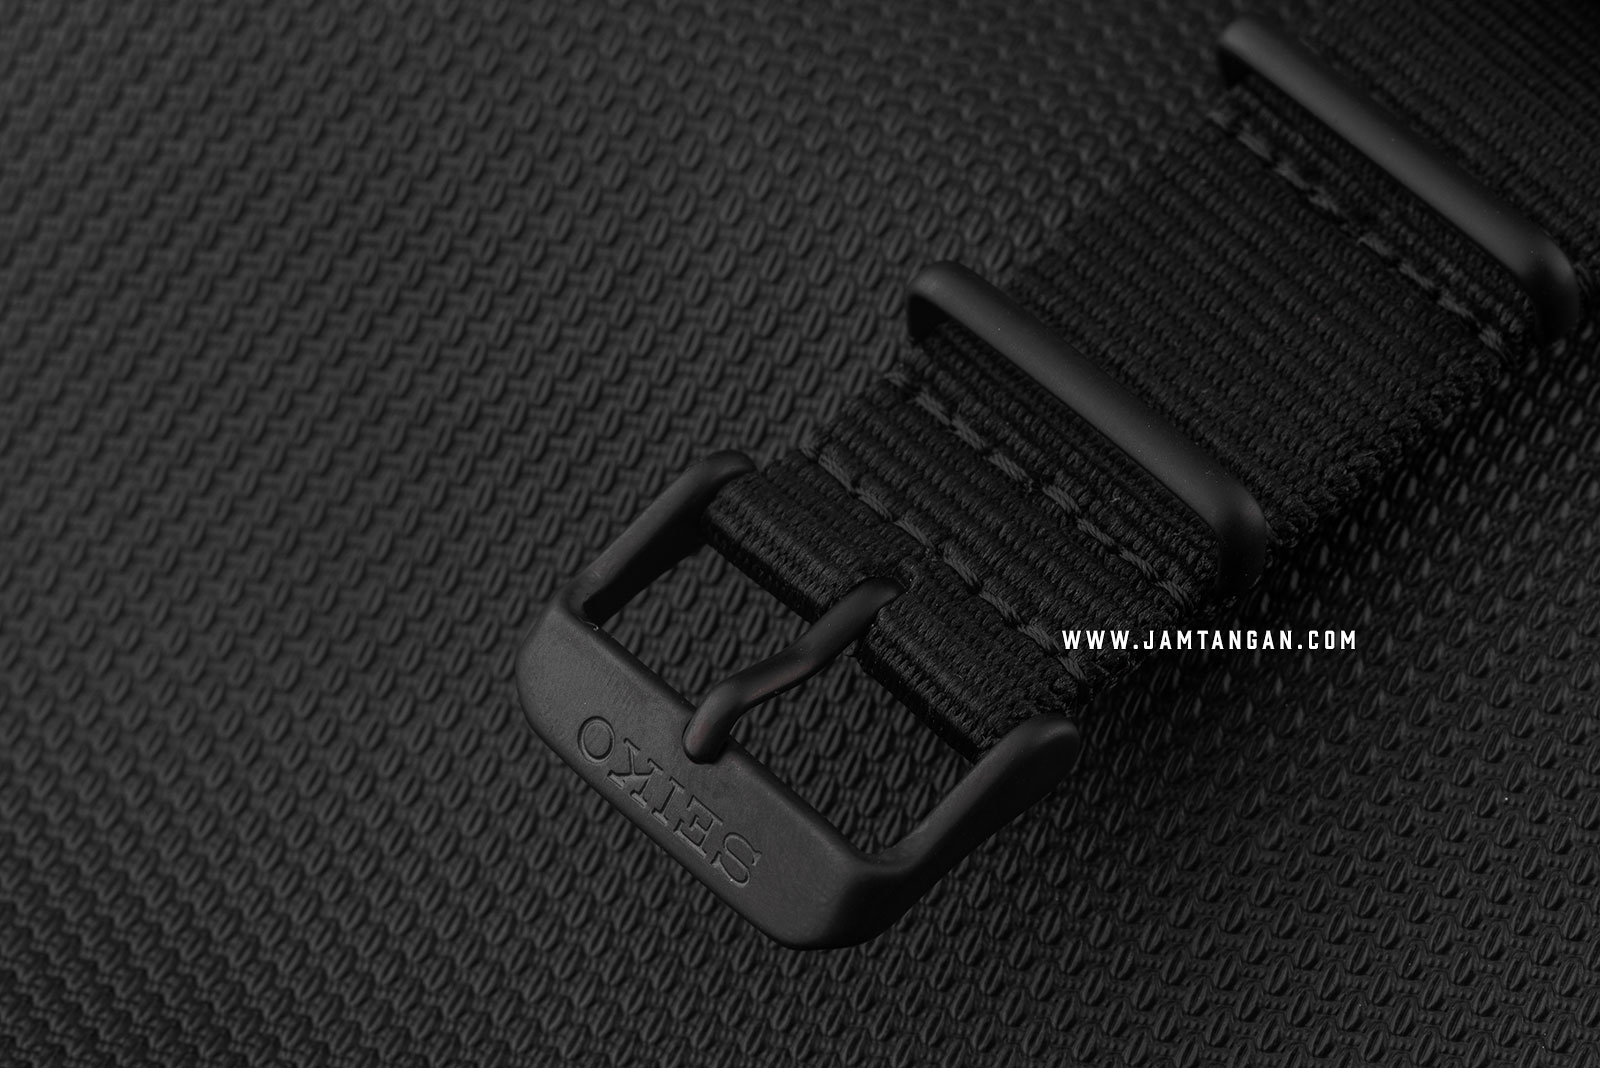 Seiko 5 Sports SRPD79K1 Automatic Black Dial Black Nylon Strap Machtwatch